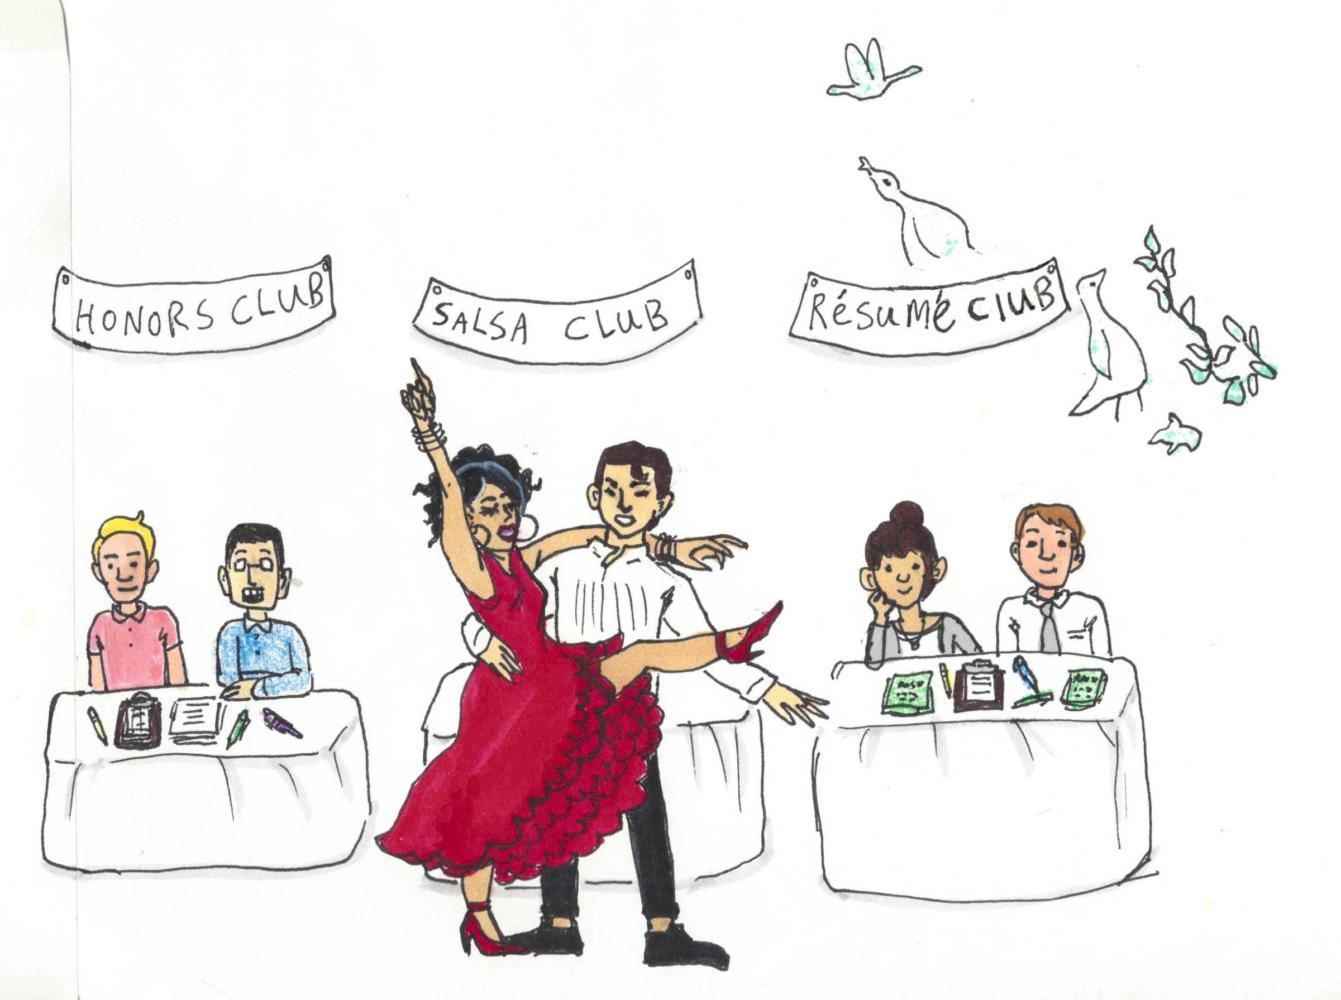 (Illustration by Sylvia Freeman | Staff Illustrator)